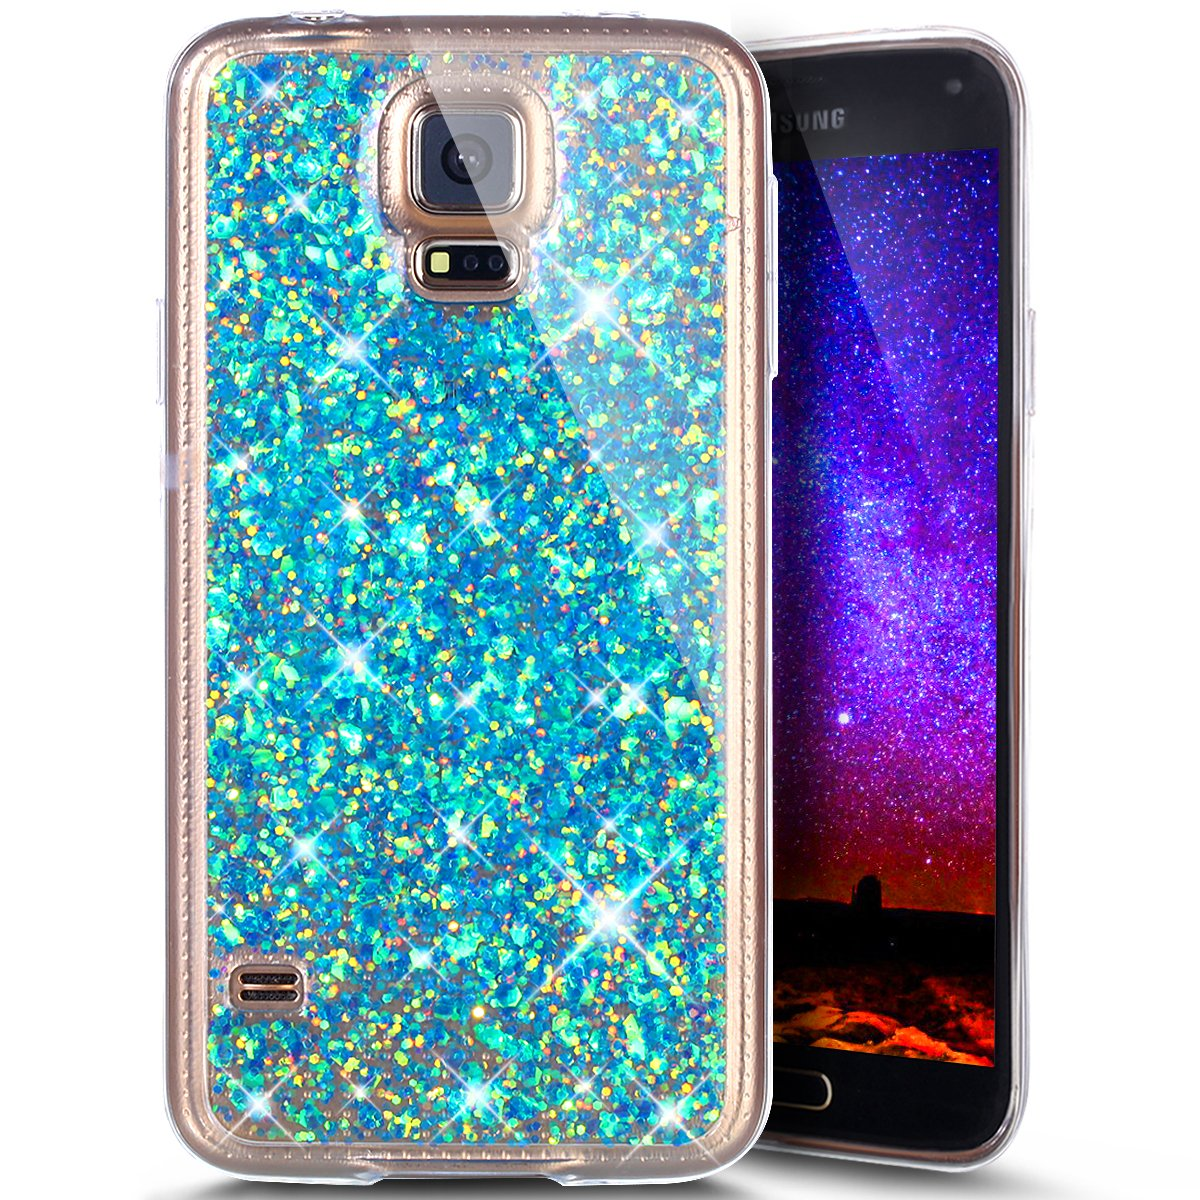 Galaxy s5ケース, Galaxy s5 Bling Glitter TPUケース、phezen Shiny Sparkling Hexagonal Star柔軟なソフトラバージェルクリアTpuケースシリコンバックケースfor Samsung Galaxy s5 (レッド) PHEZEN04700  Hexagonal Star: Blue B0721GZG9Q